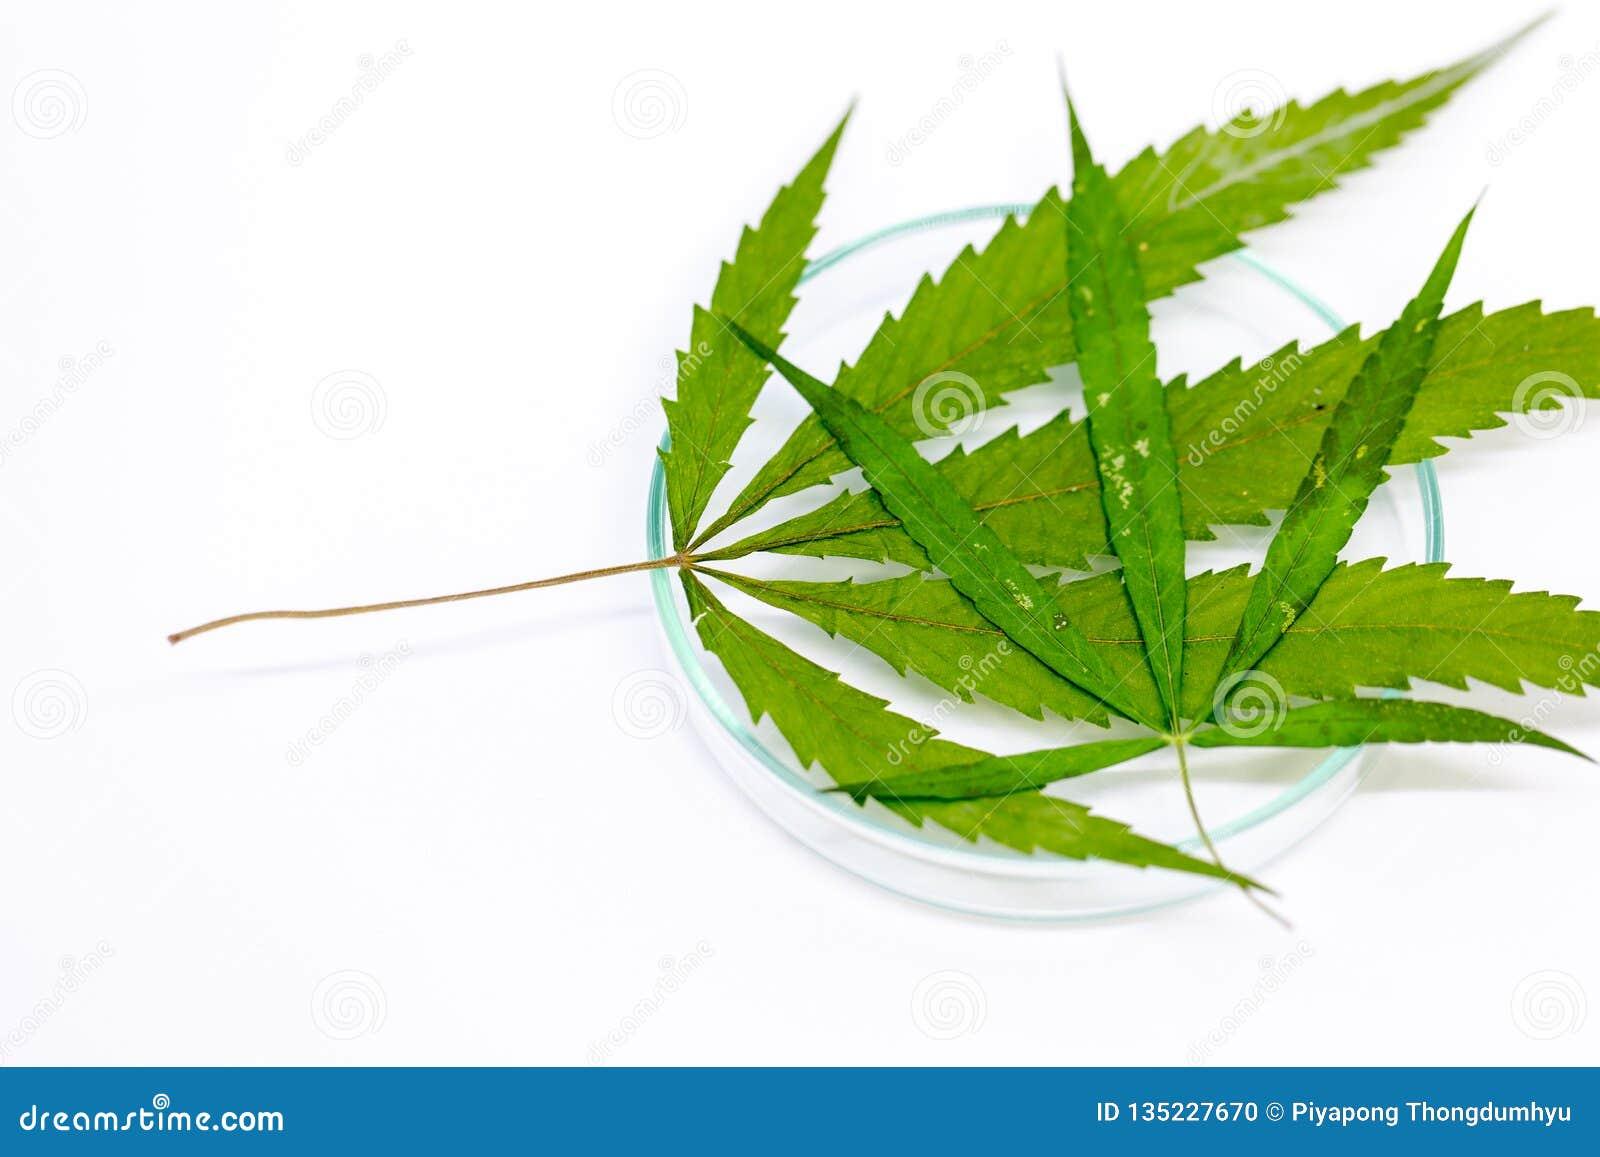 Cannabis förgiftar, analys av cannabis i laboratorium